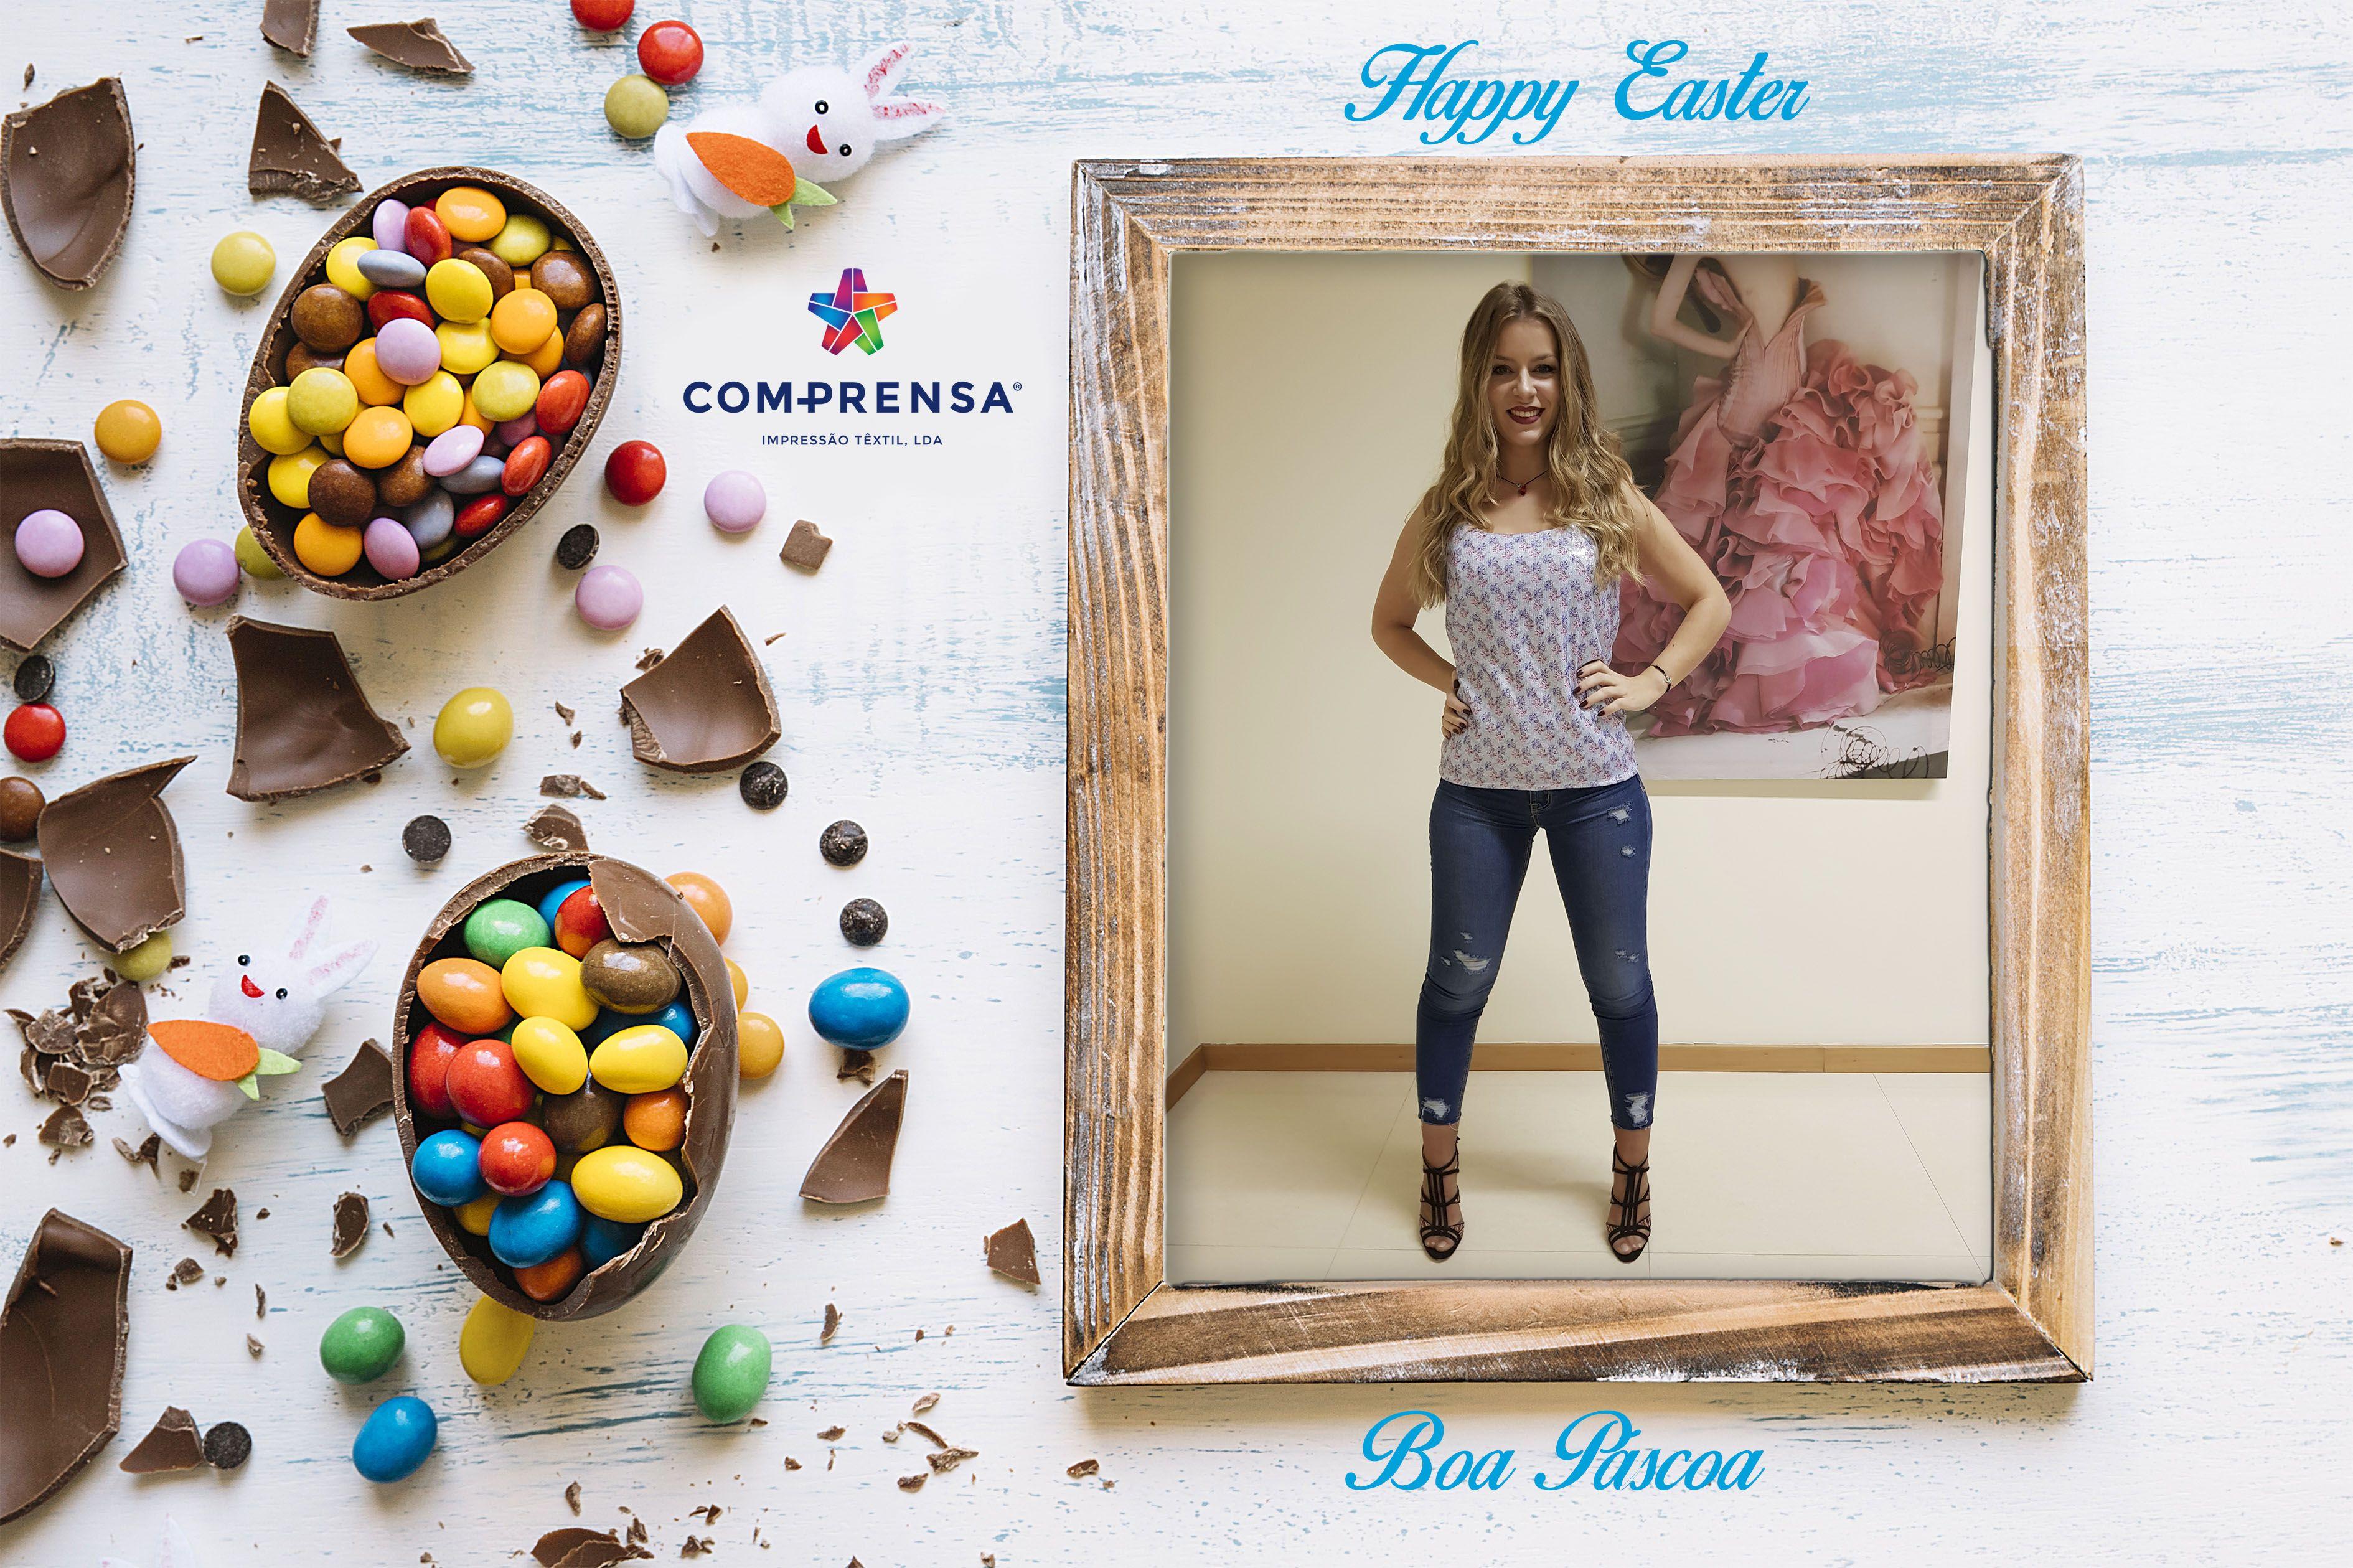 Happy Easter  Boa Páscoa  #comprensa #model #fashion #manufacturer #design #company #textile #portugal #jersey #fleece #cotton #bio #sublimation #screenprinting #digitalprint #laser #photoprint